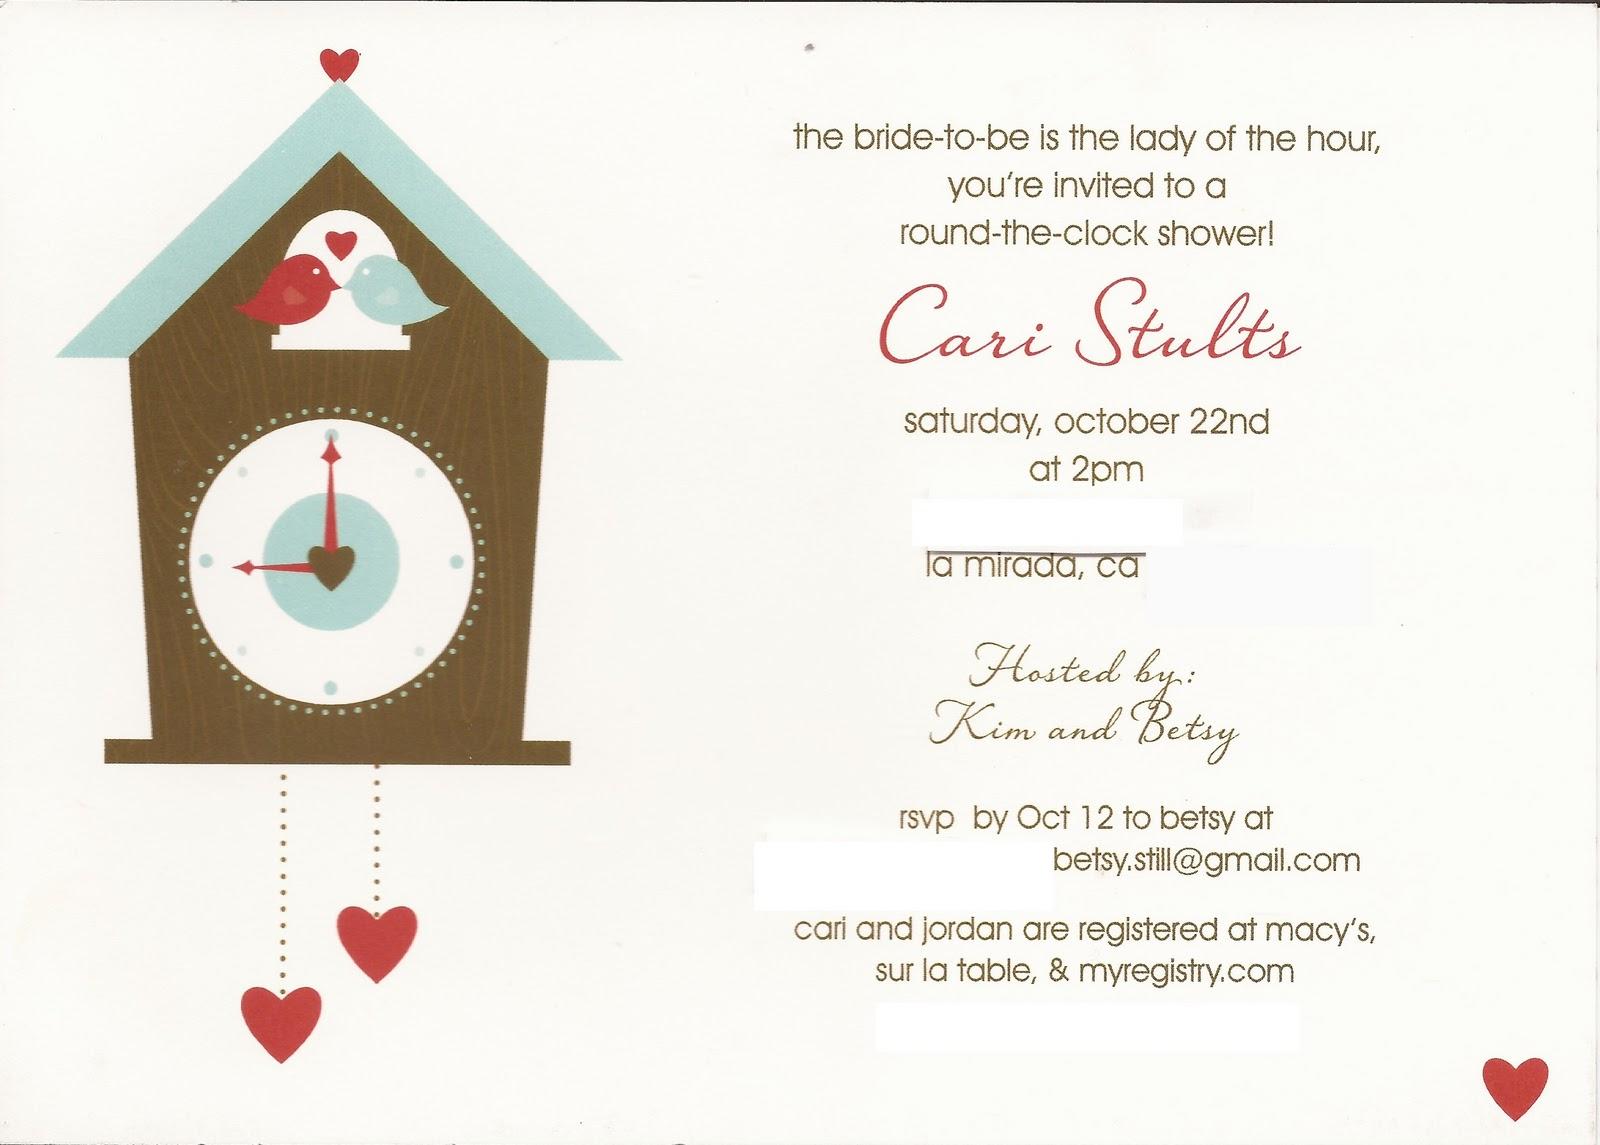 Around The Clock Wedding Shower - Locallygrownweddings.com